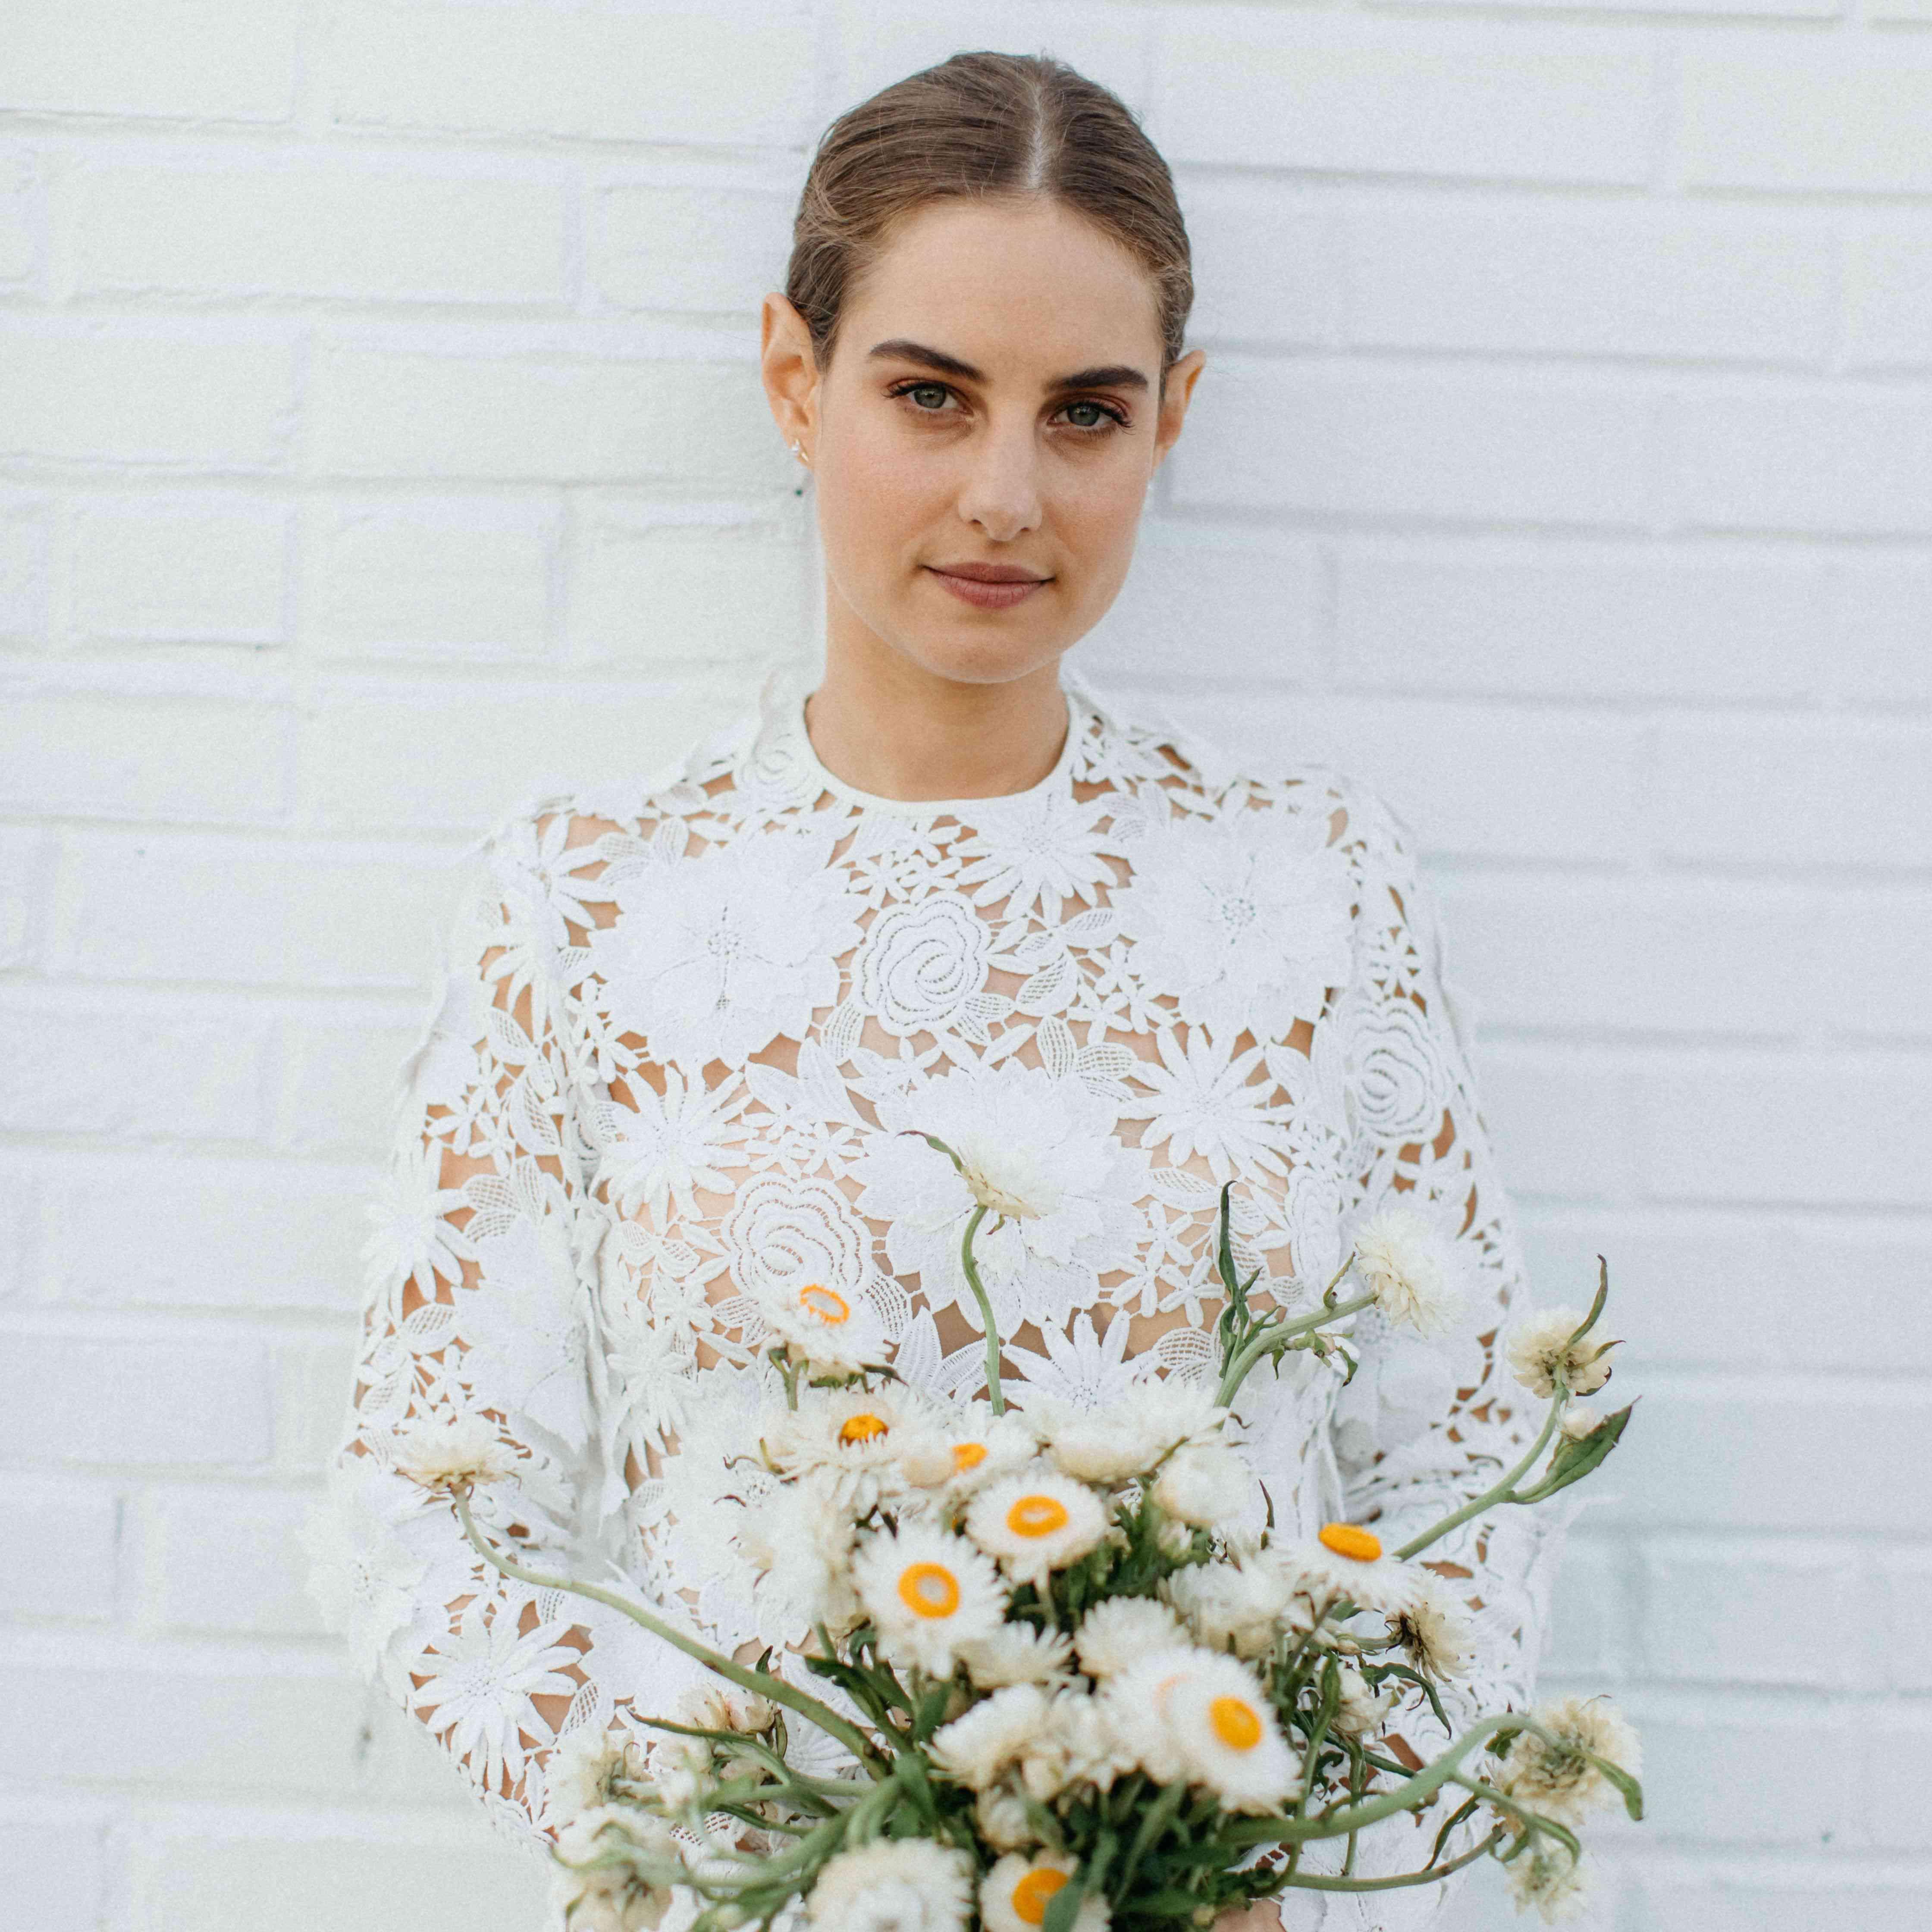 Bride holding daisies